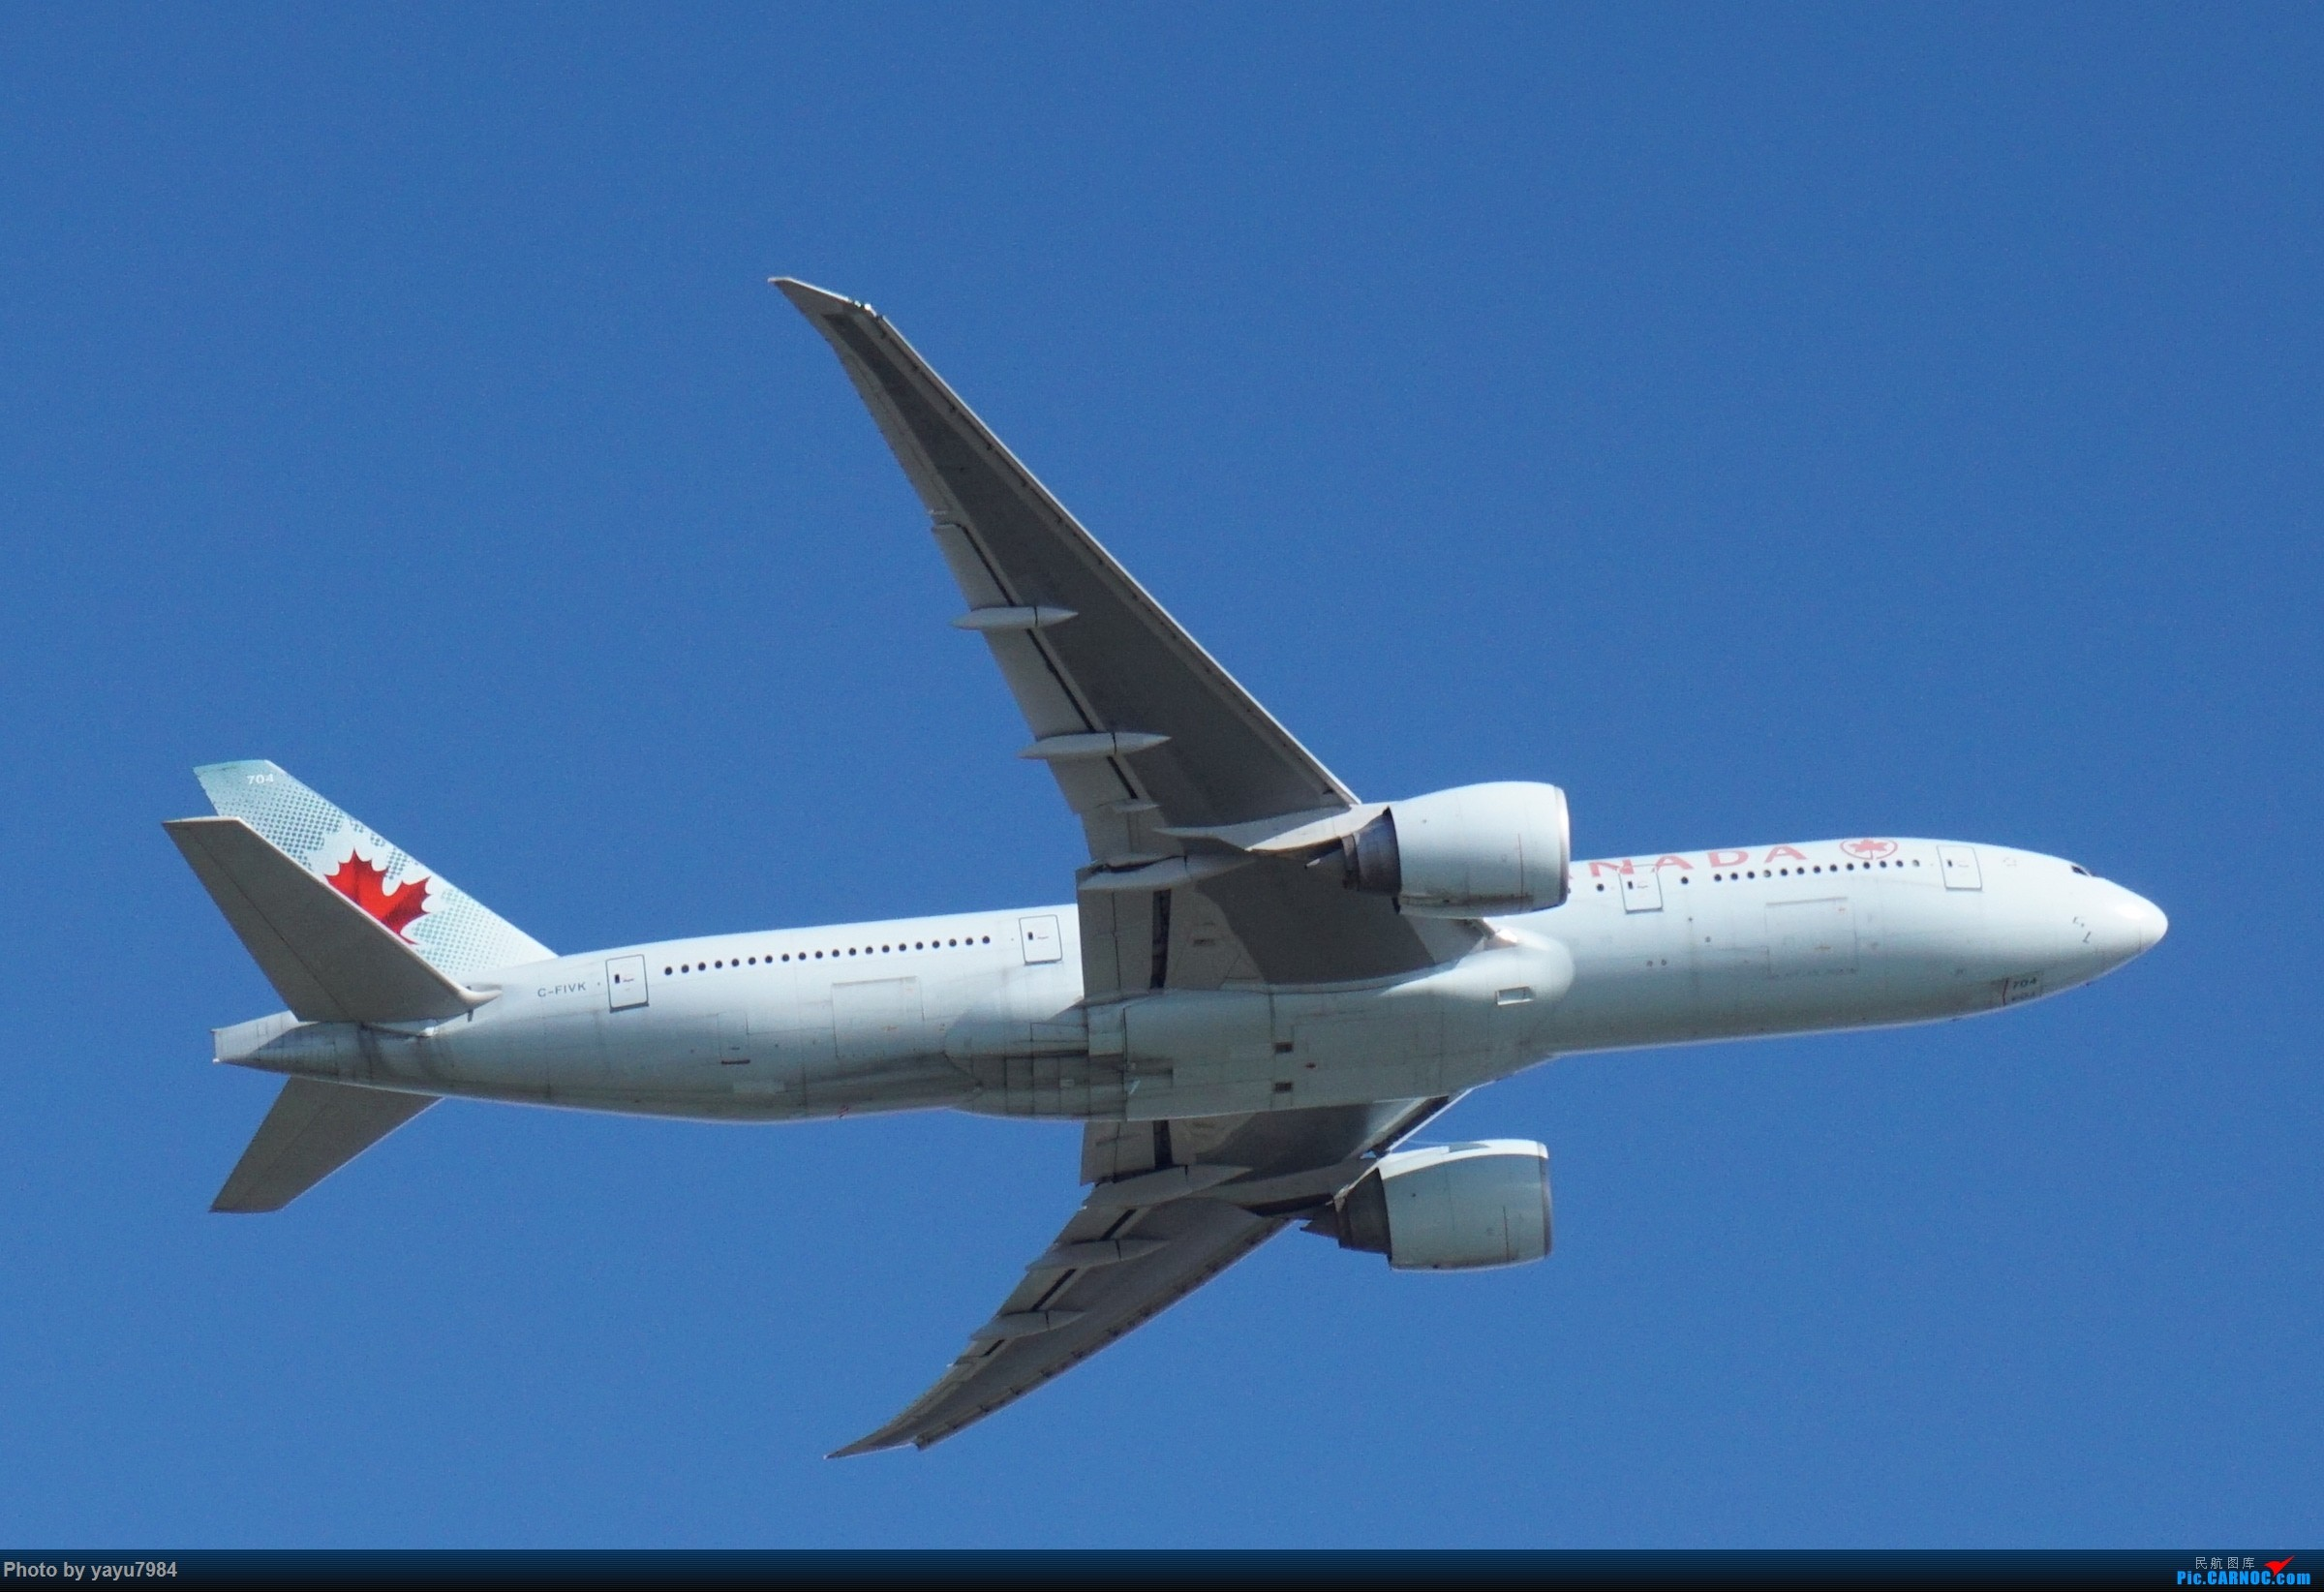 Re:[原创][SYD] 近期随摄,收获颇多 BOEING 777-200LR C-FIVK 澳大利亚悉尼金斯福德·史密斯机场